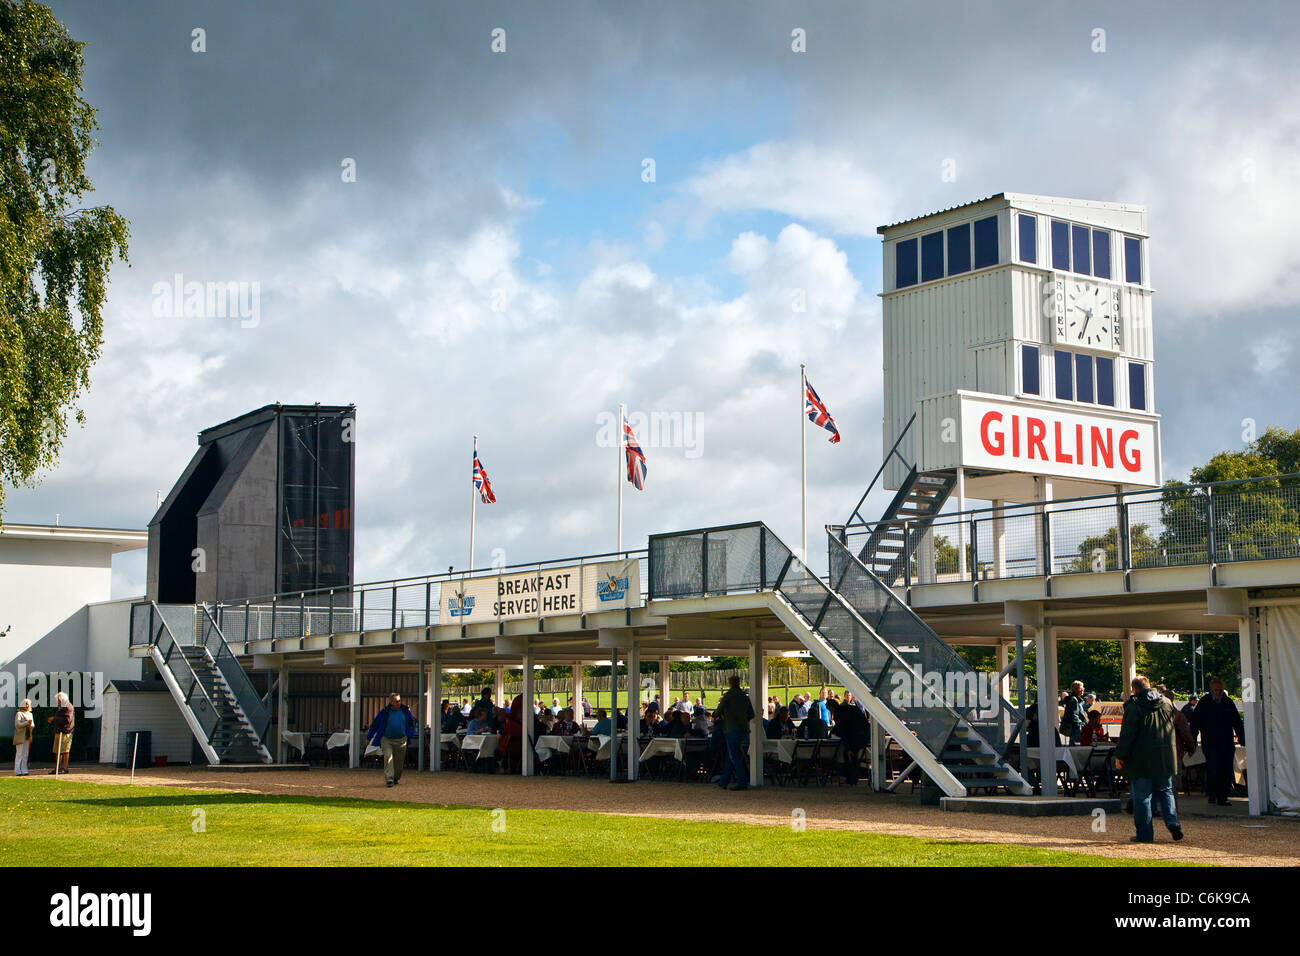 Goodwood Breakfast Club meeting, Goodwood motor racing circuit, West Sussex, Great Britain UK - Stock Image